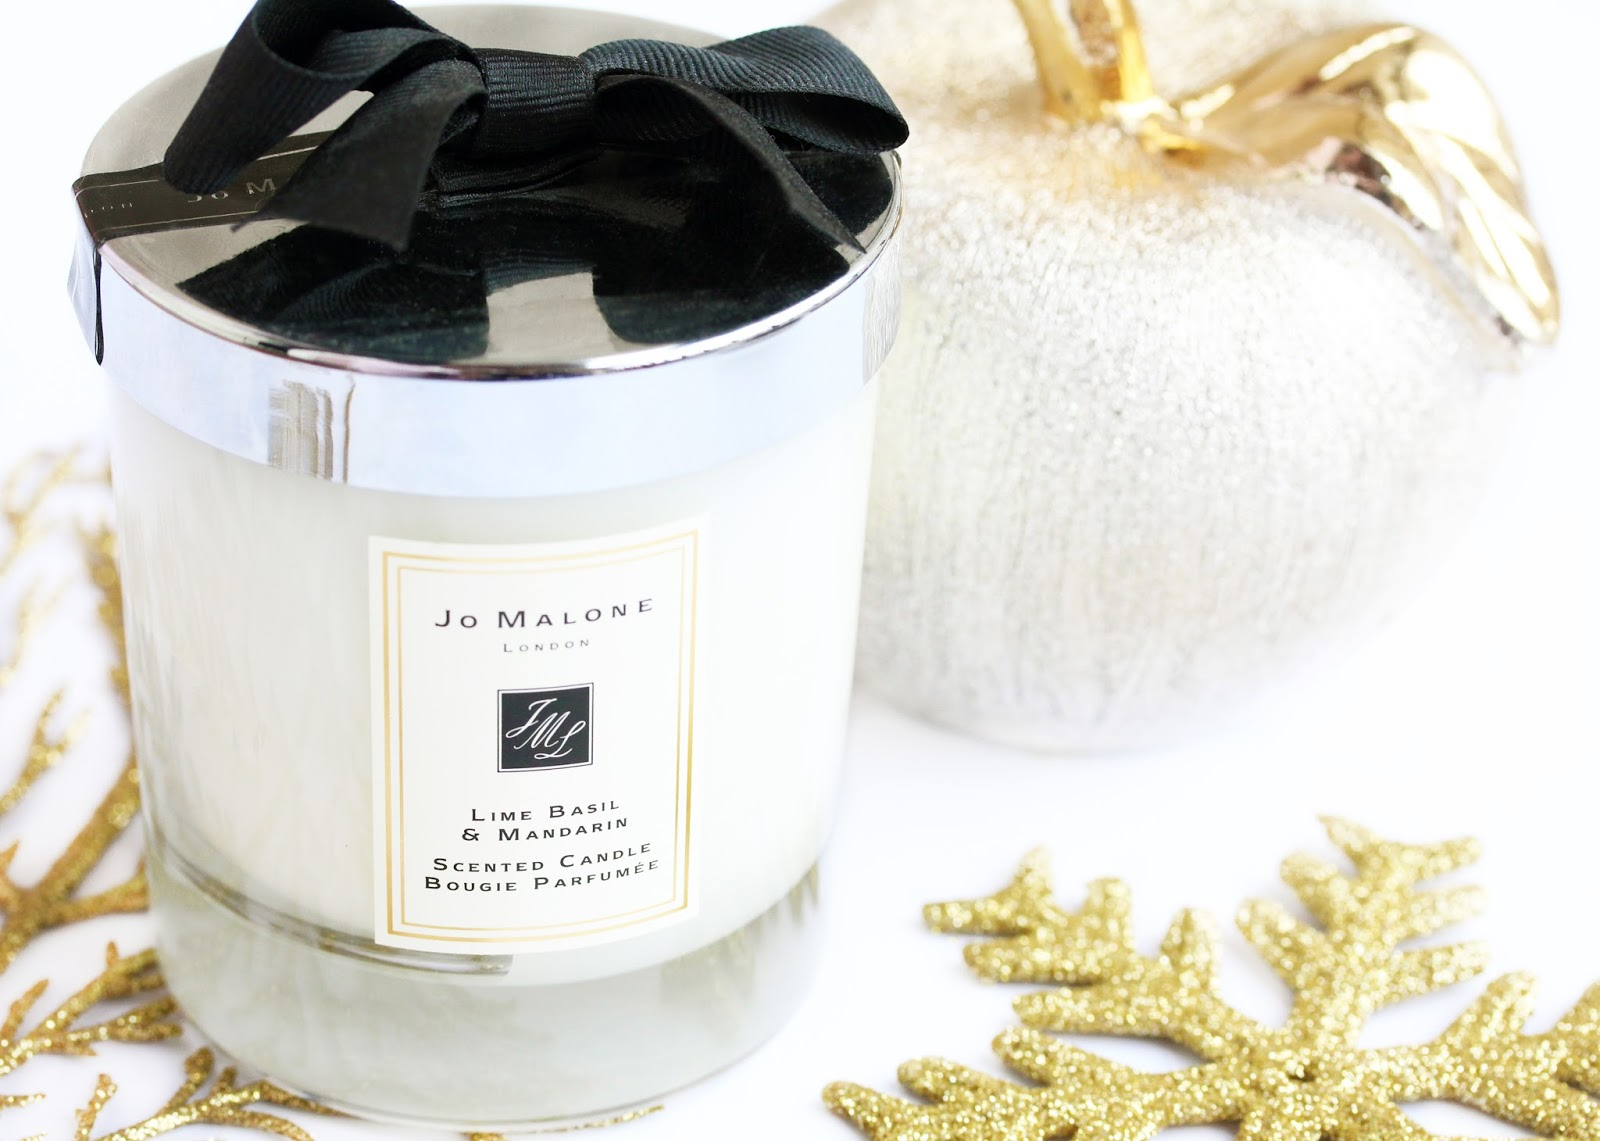 Jo Malone Lime Basil & Mandarine Candle